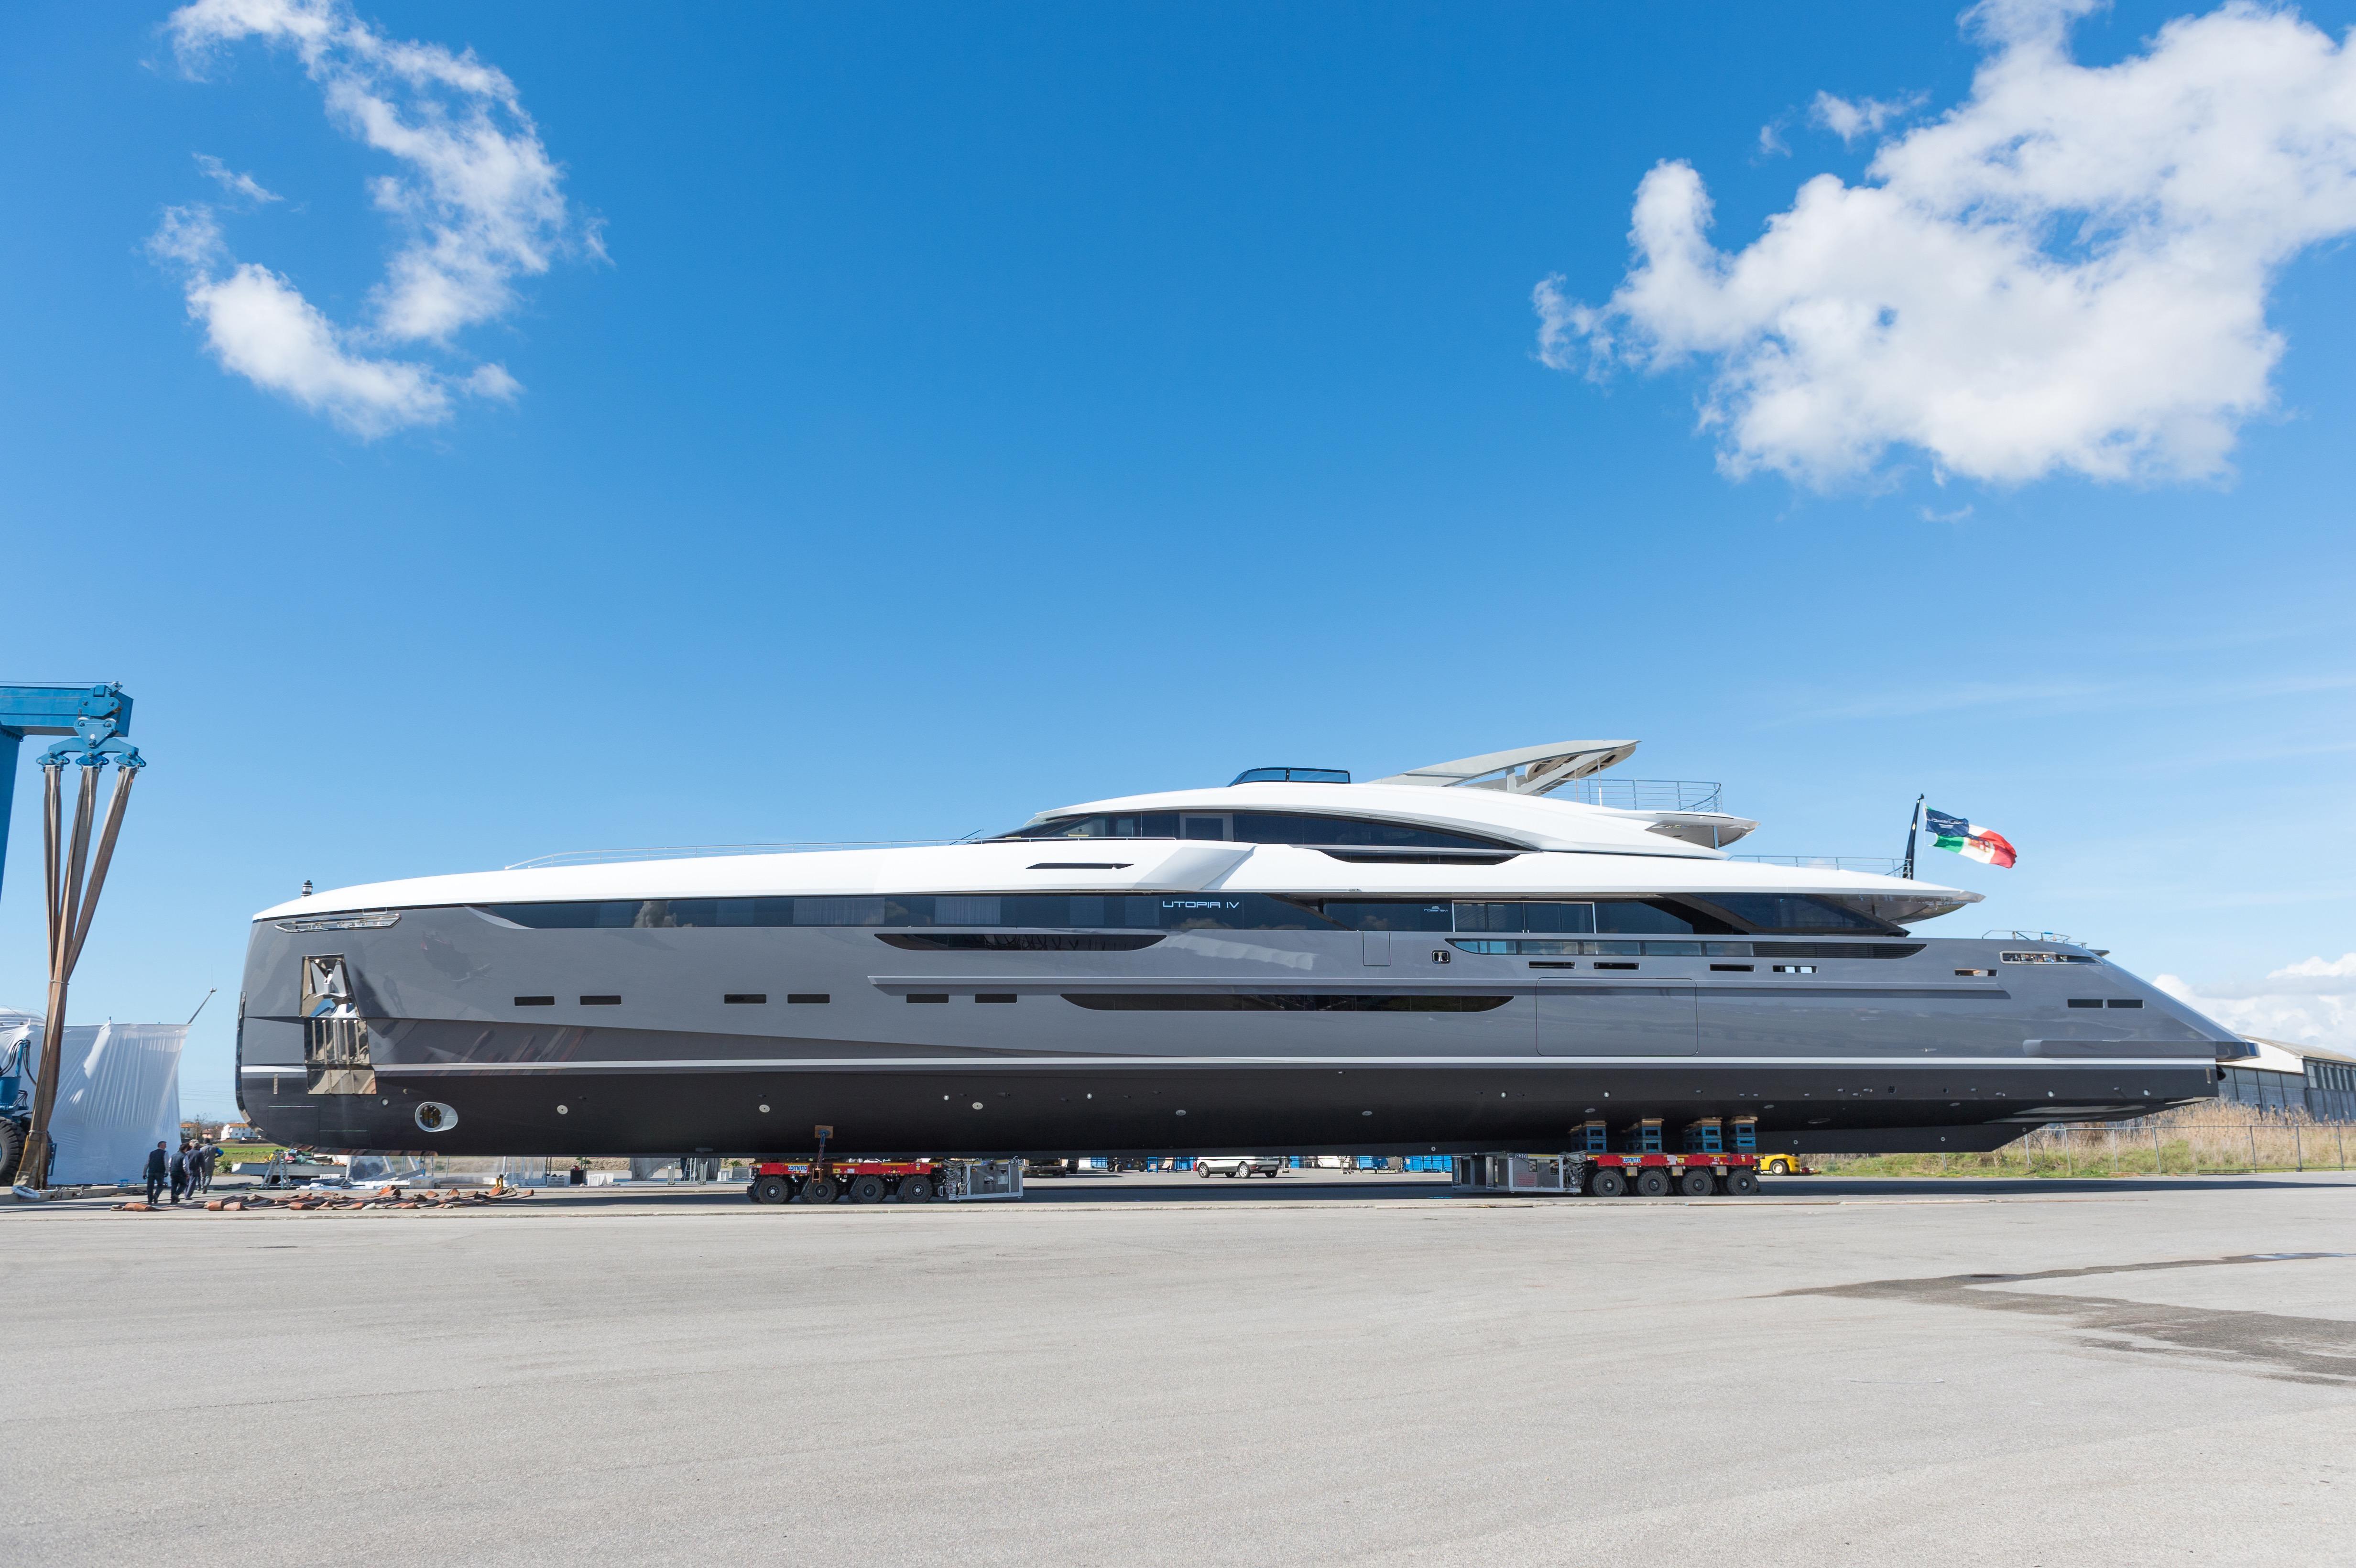 Yacht Utopia Iv Rossinavi Charterworld Luxury Superyacht Charters